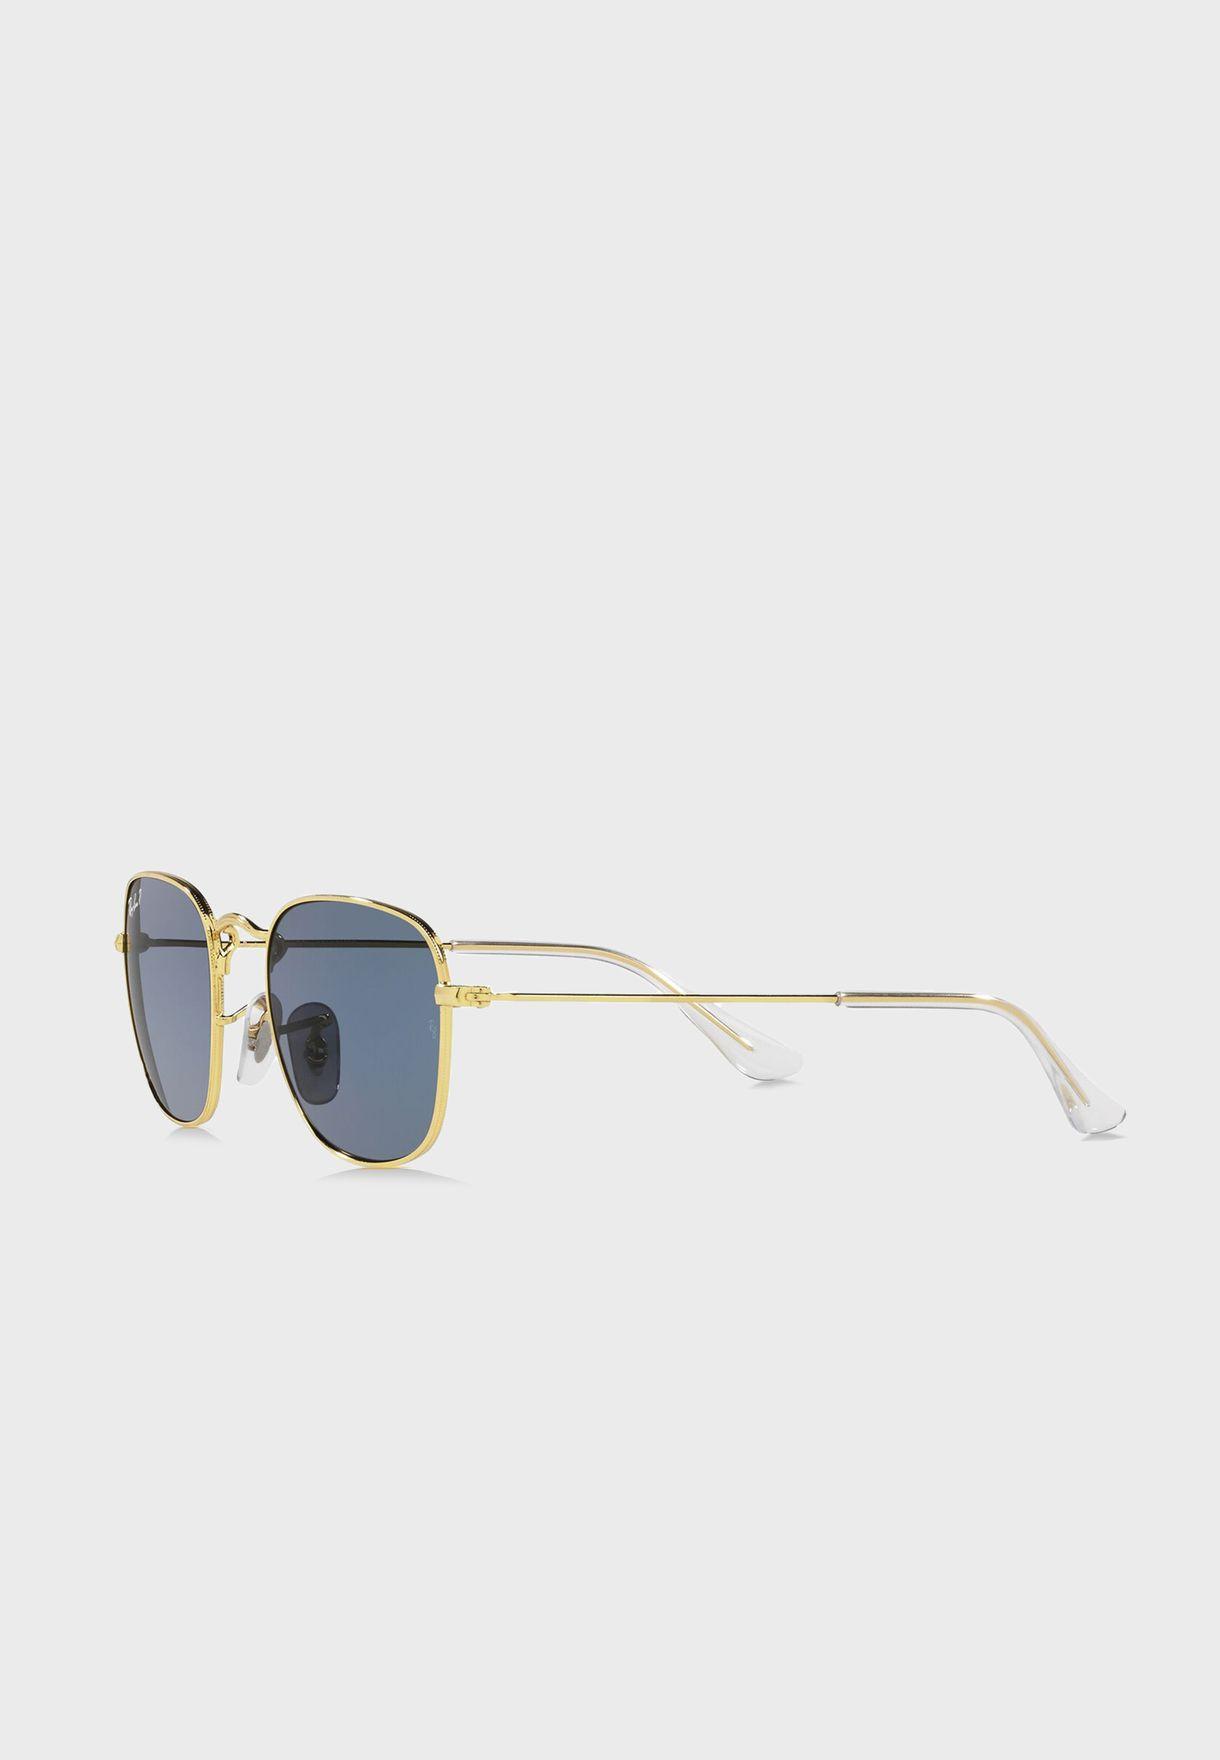 0Rj9557S Sunglasses